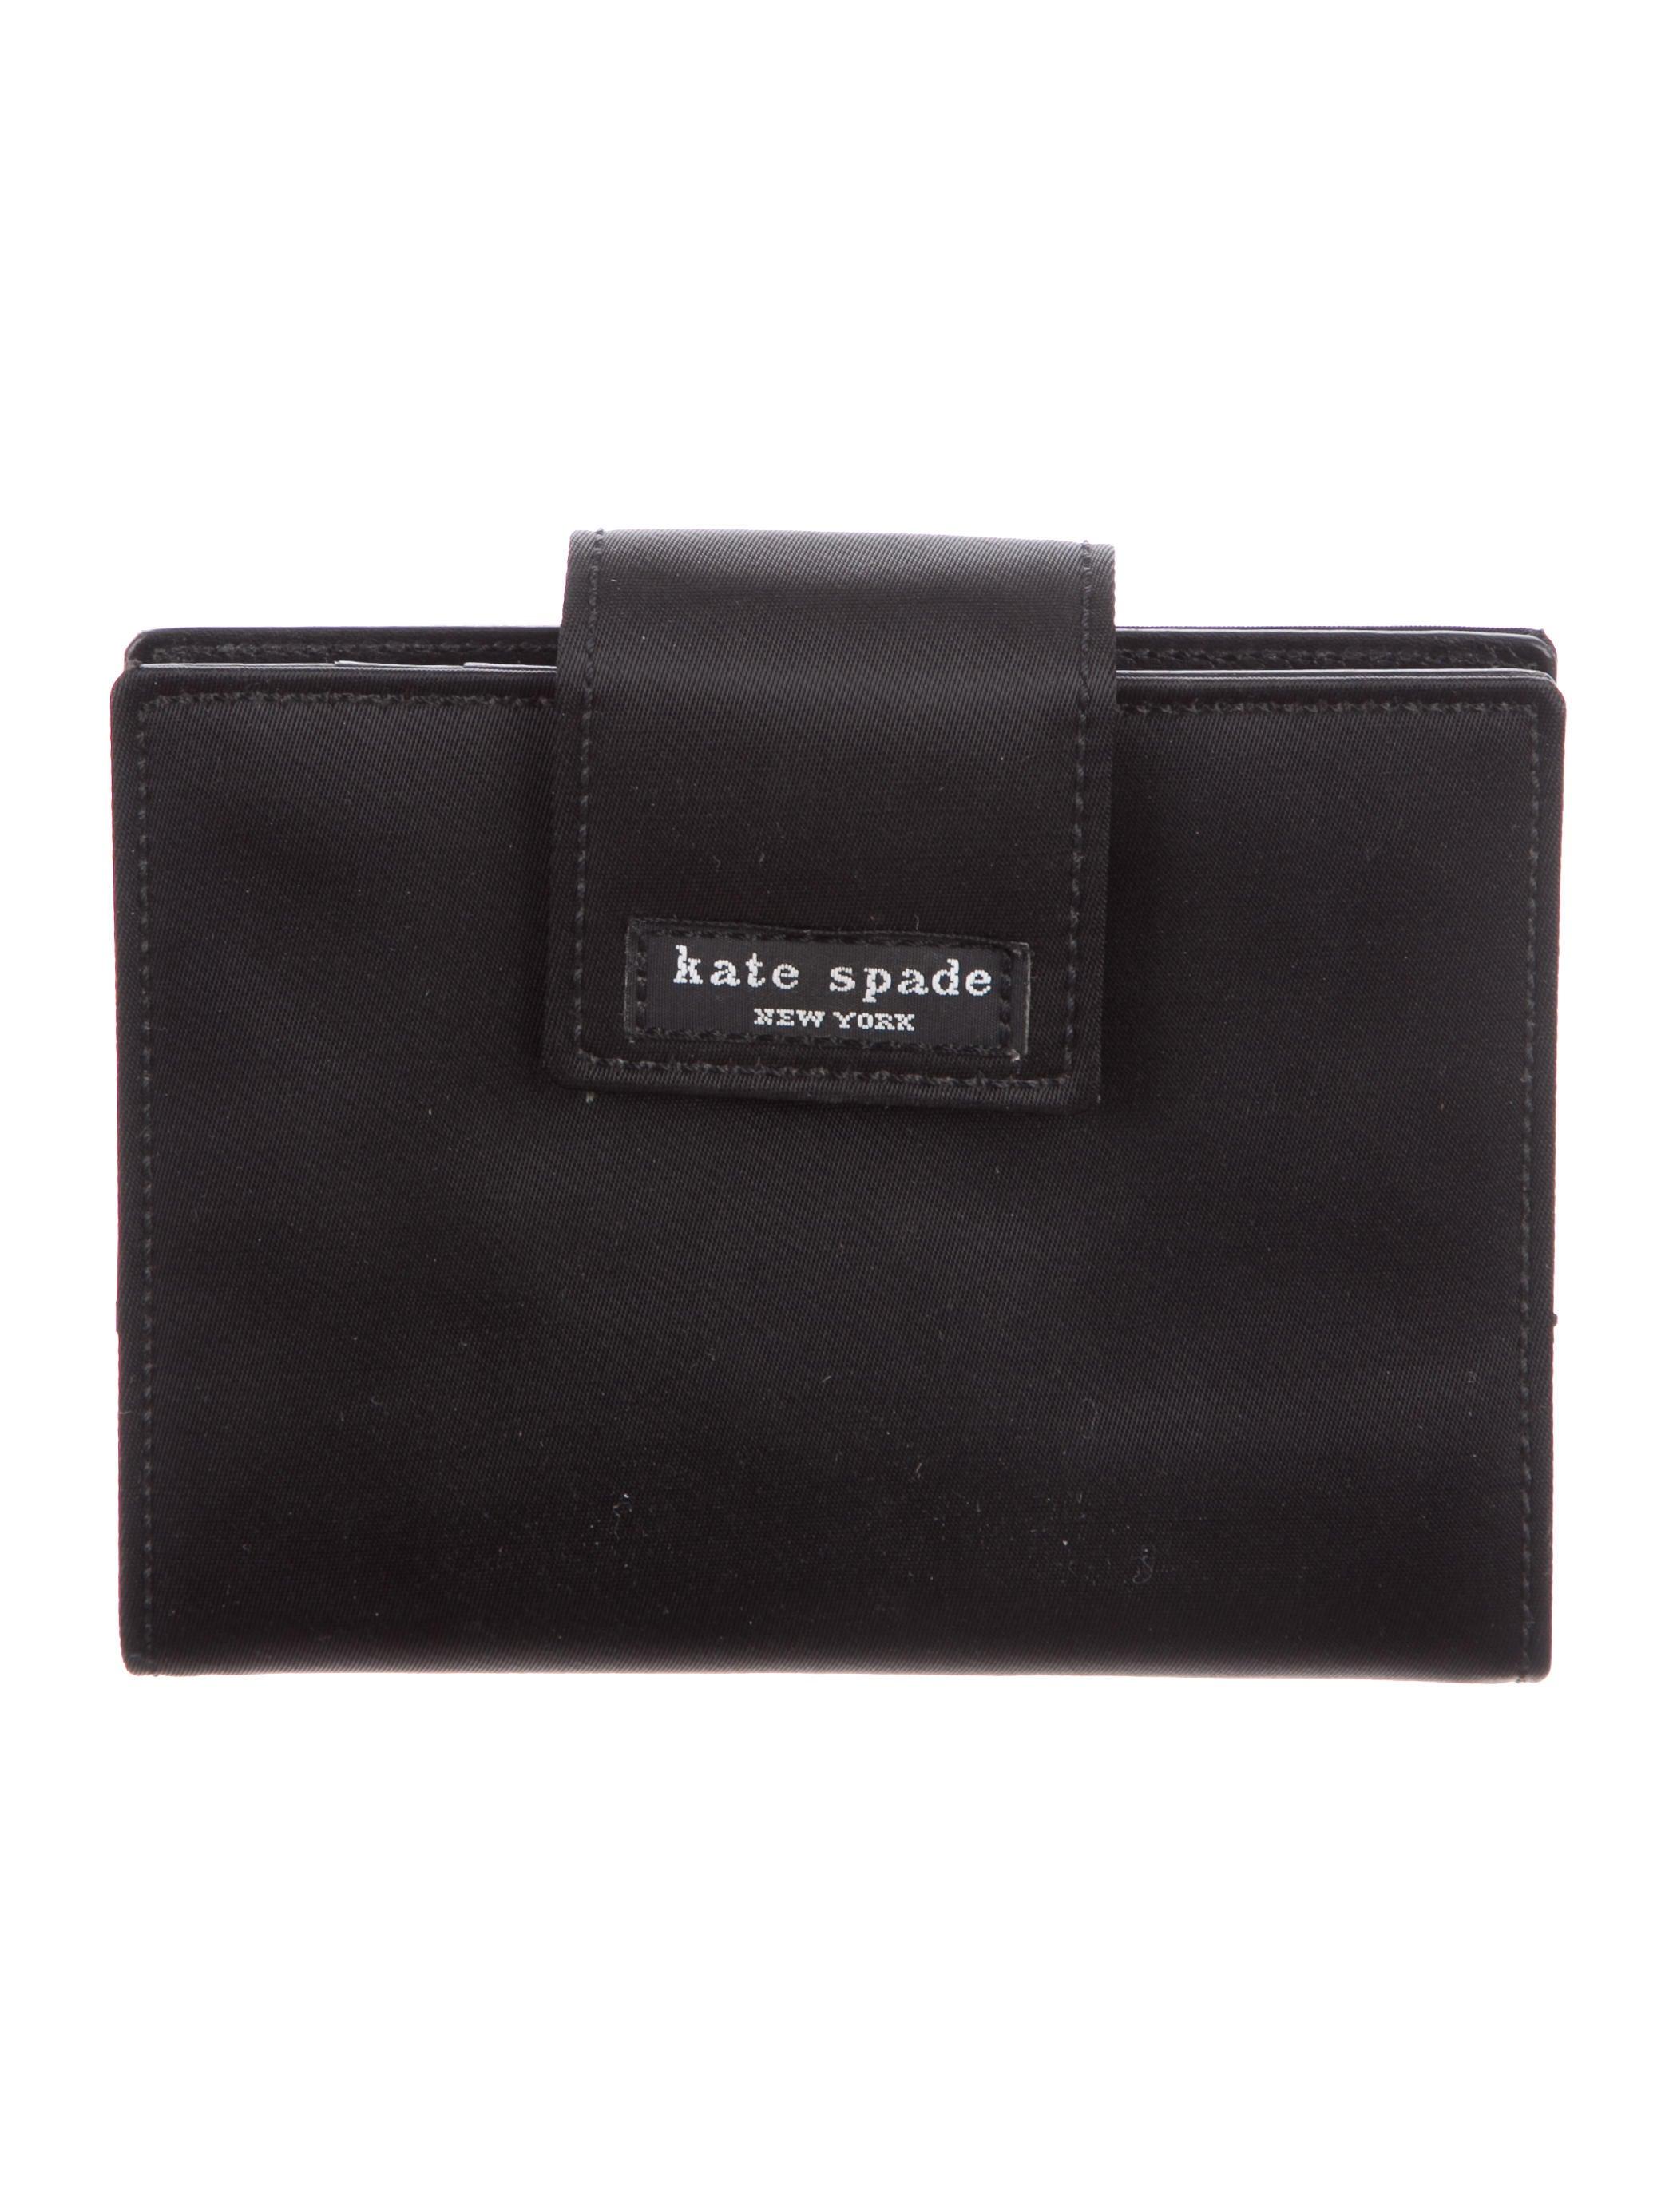 kate spade new york woven agenda cover accessories wka50129 the realreal. Black Bedroom Furniture Sets. Home Design Ideas